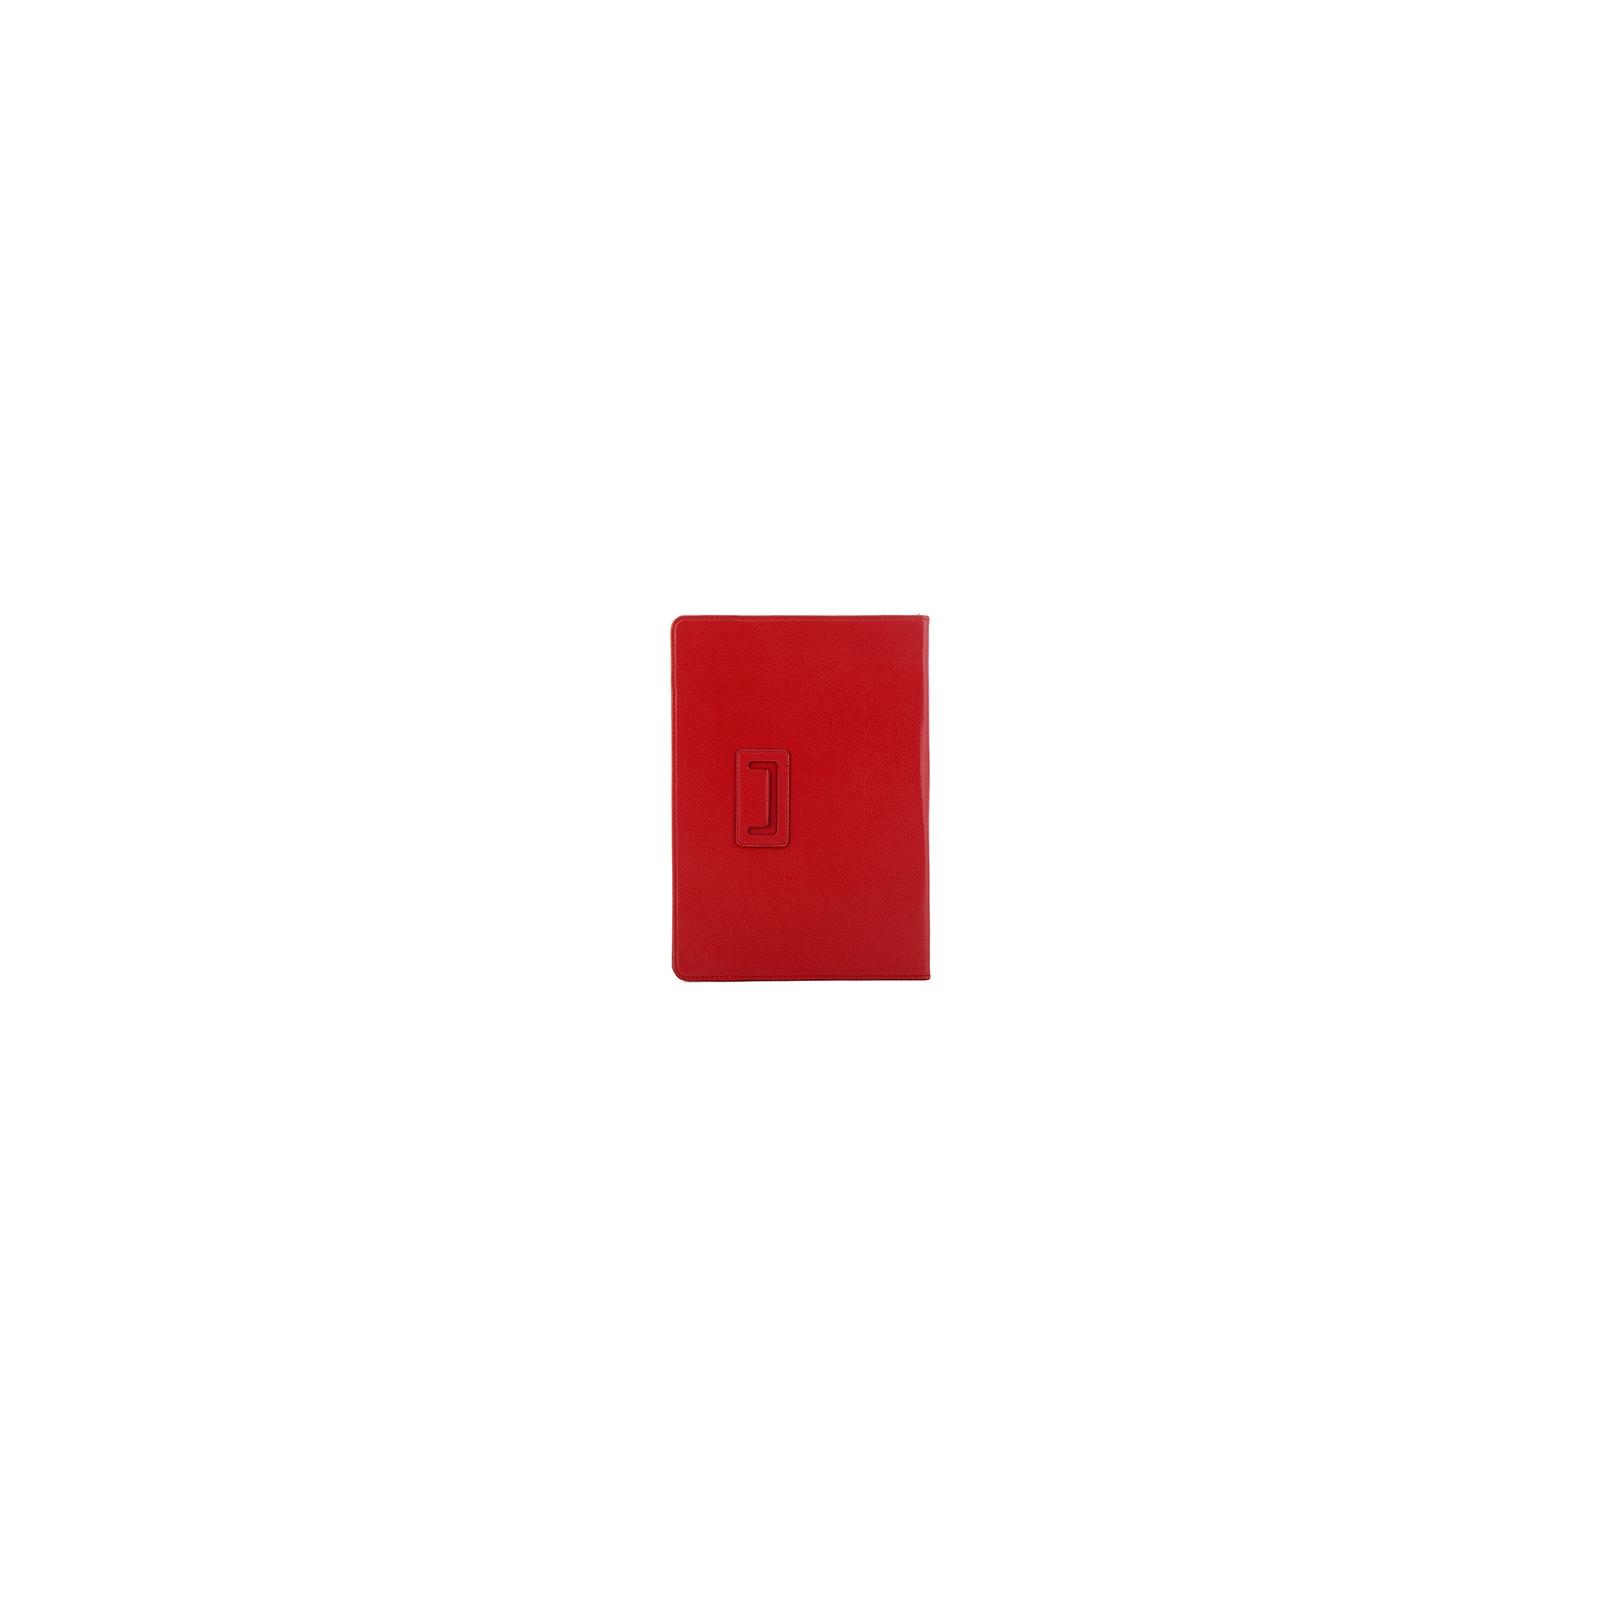 "Чехол для планшета 10""-10.1"" Cover Stand Red Drobak (216899) изображение 2"